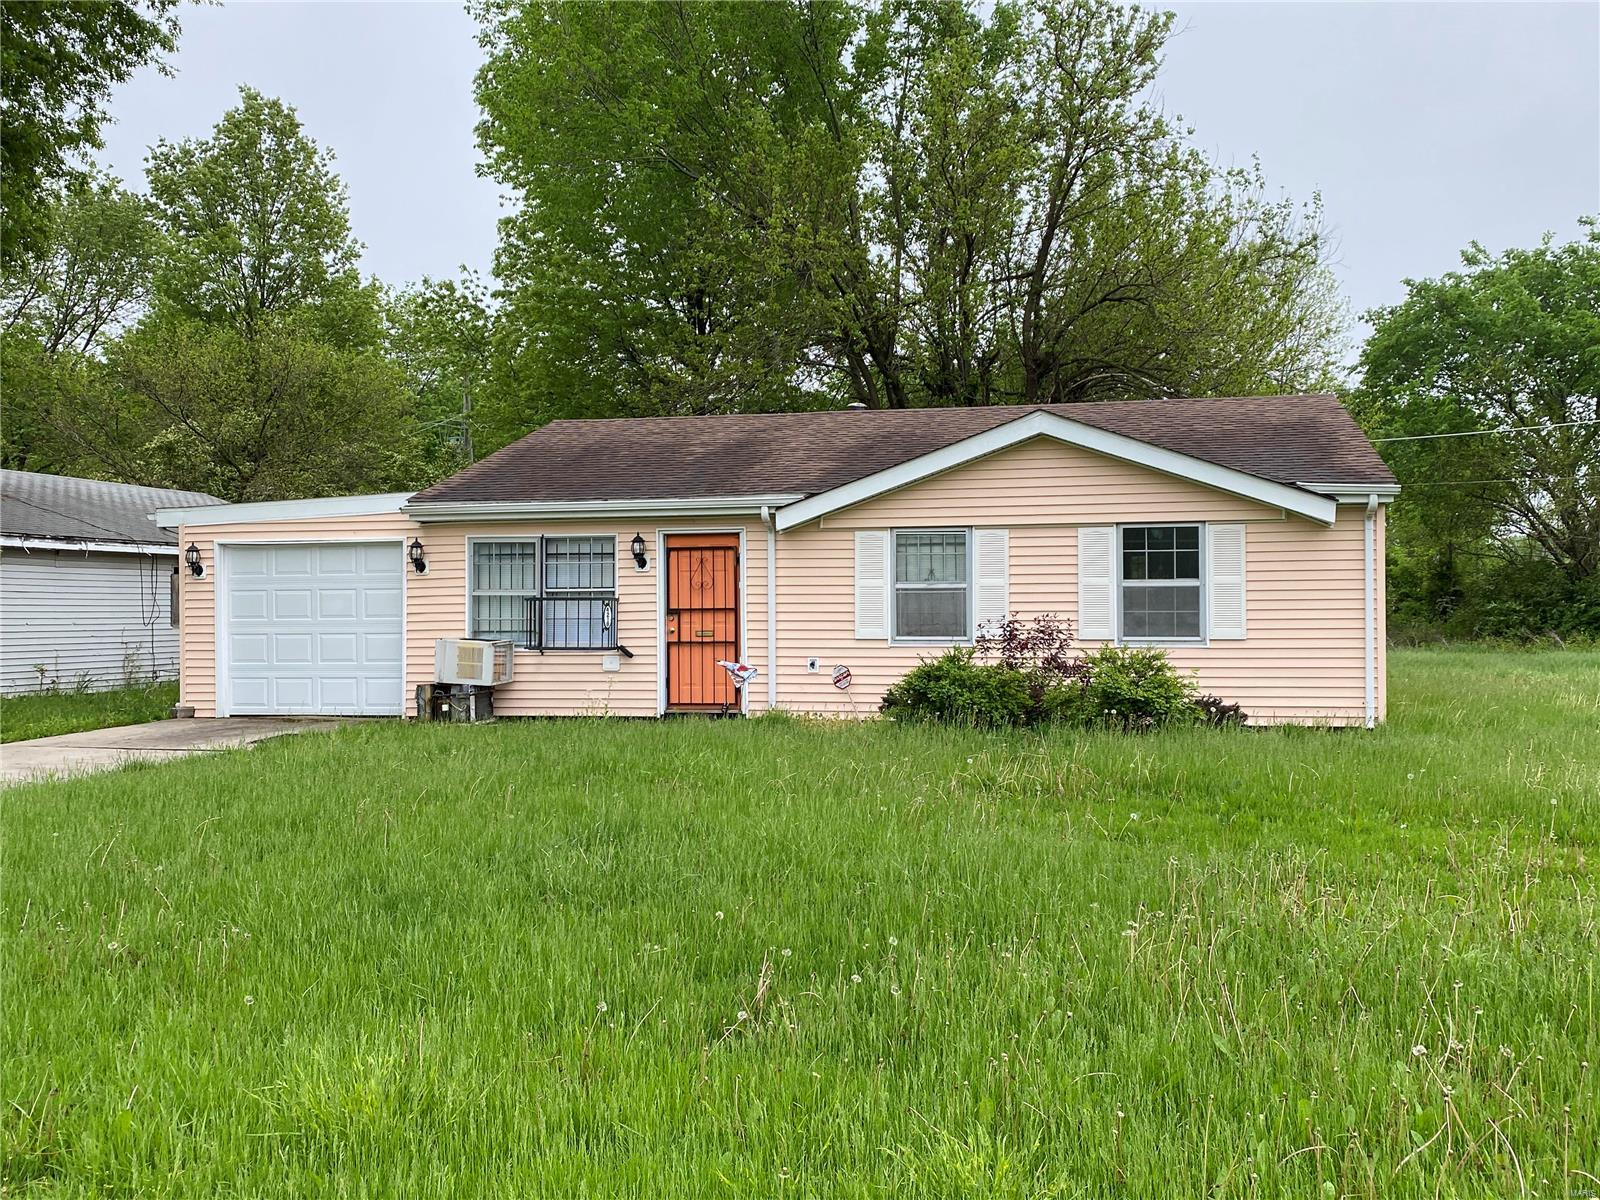 4210 N Park Property Photo - East St Louis, IL real estate listing